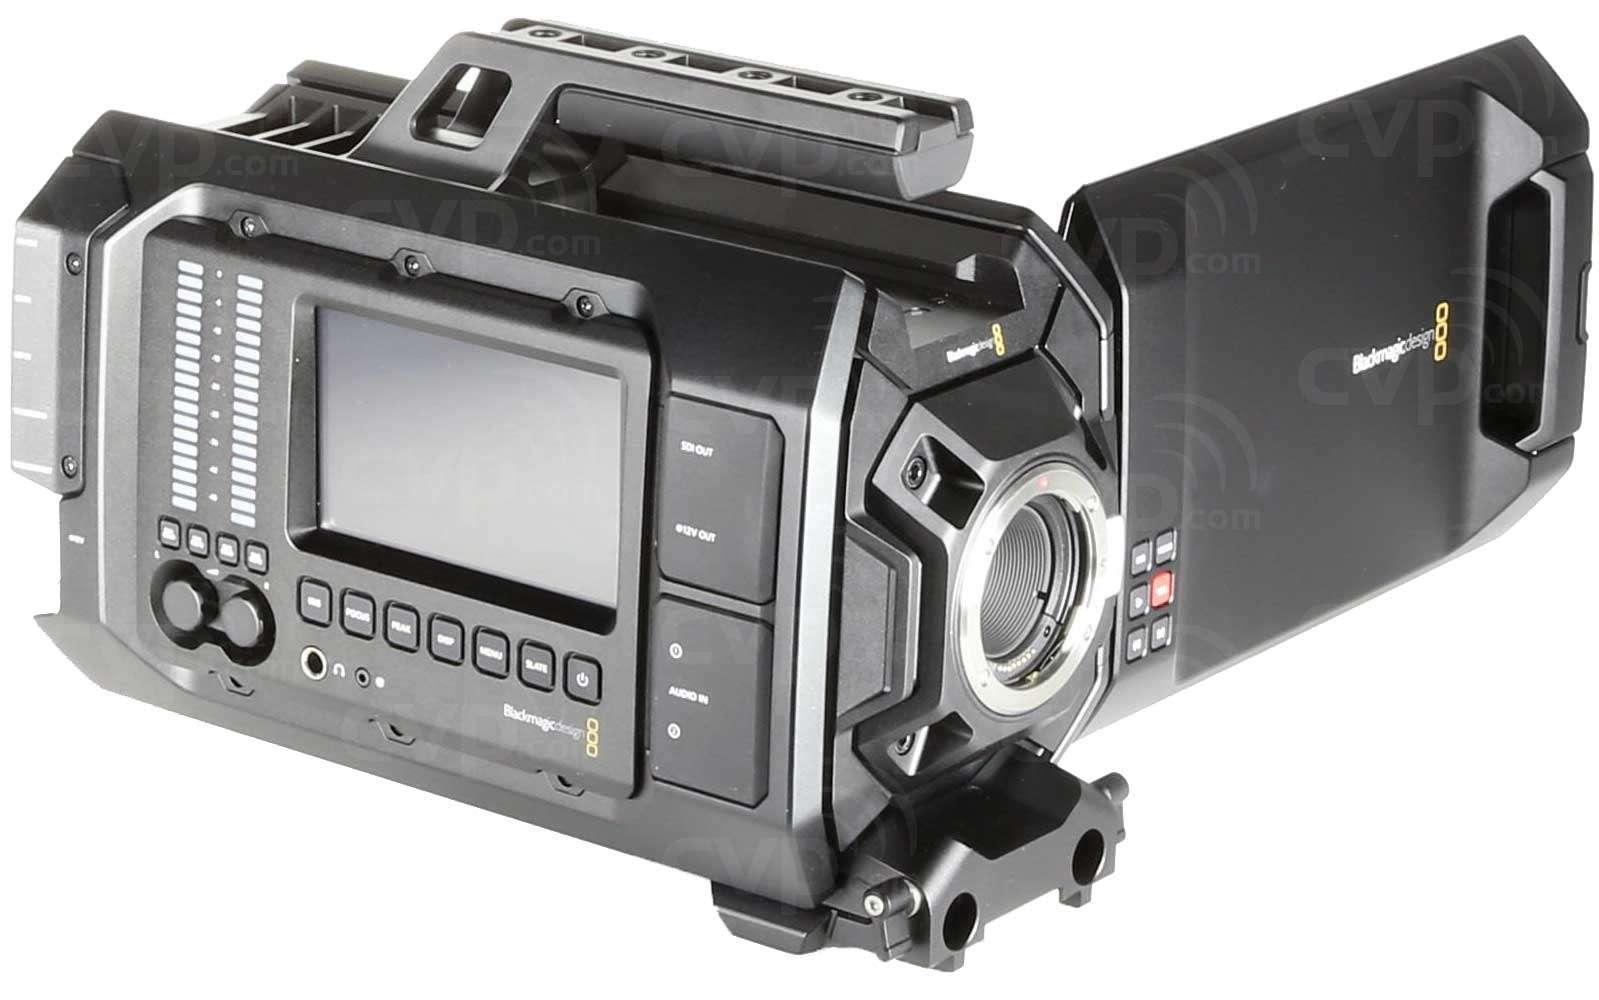 Buy - Ex-Demo Blackmagic URSA EF Mount 4K Camera with a Super 35 ...